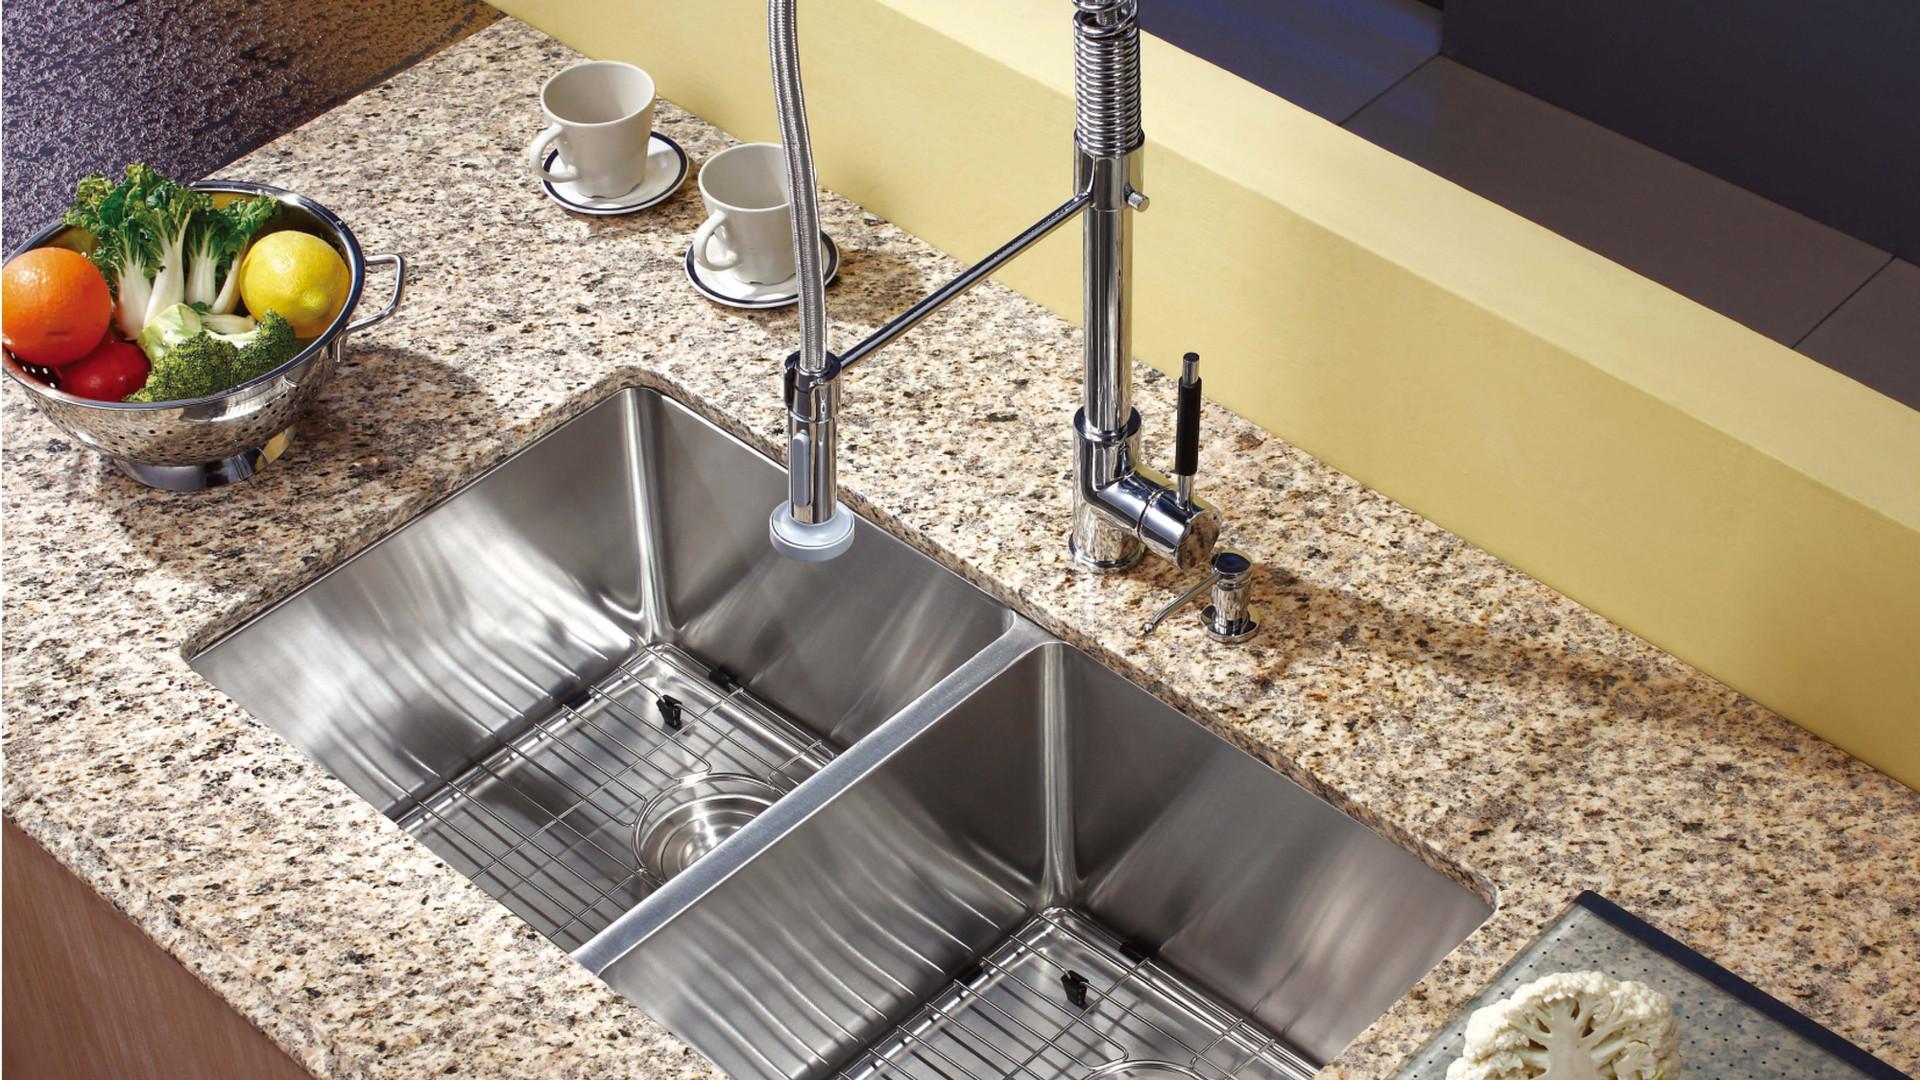 ASAPstainless sink5.jpg